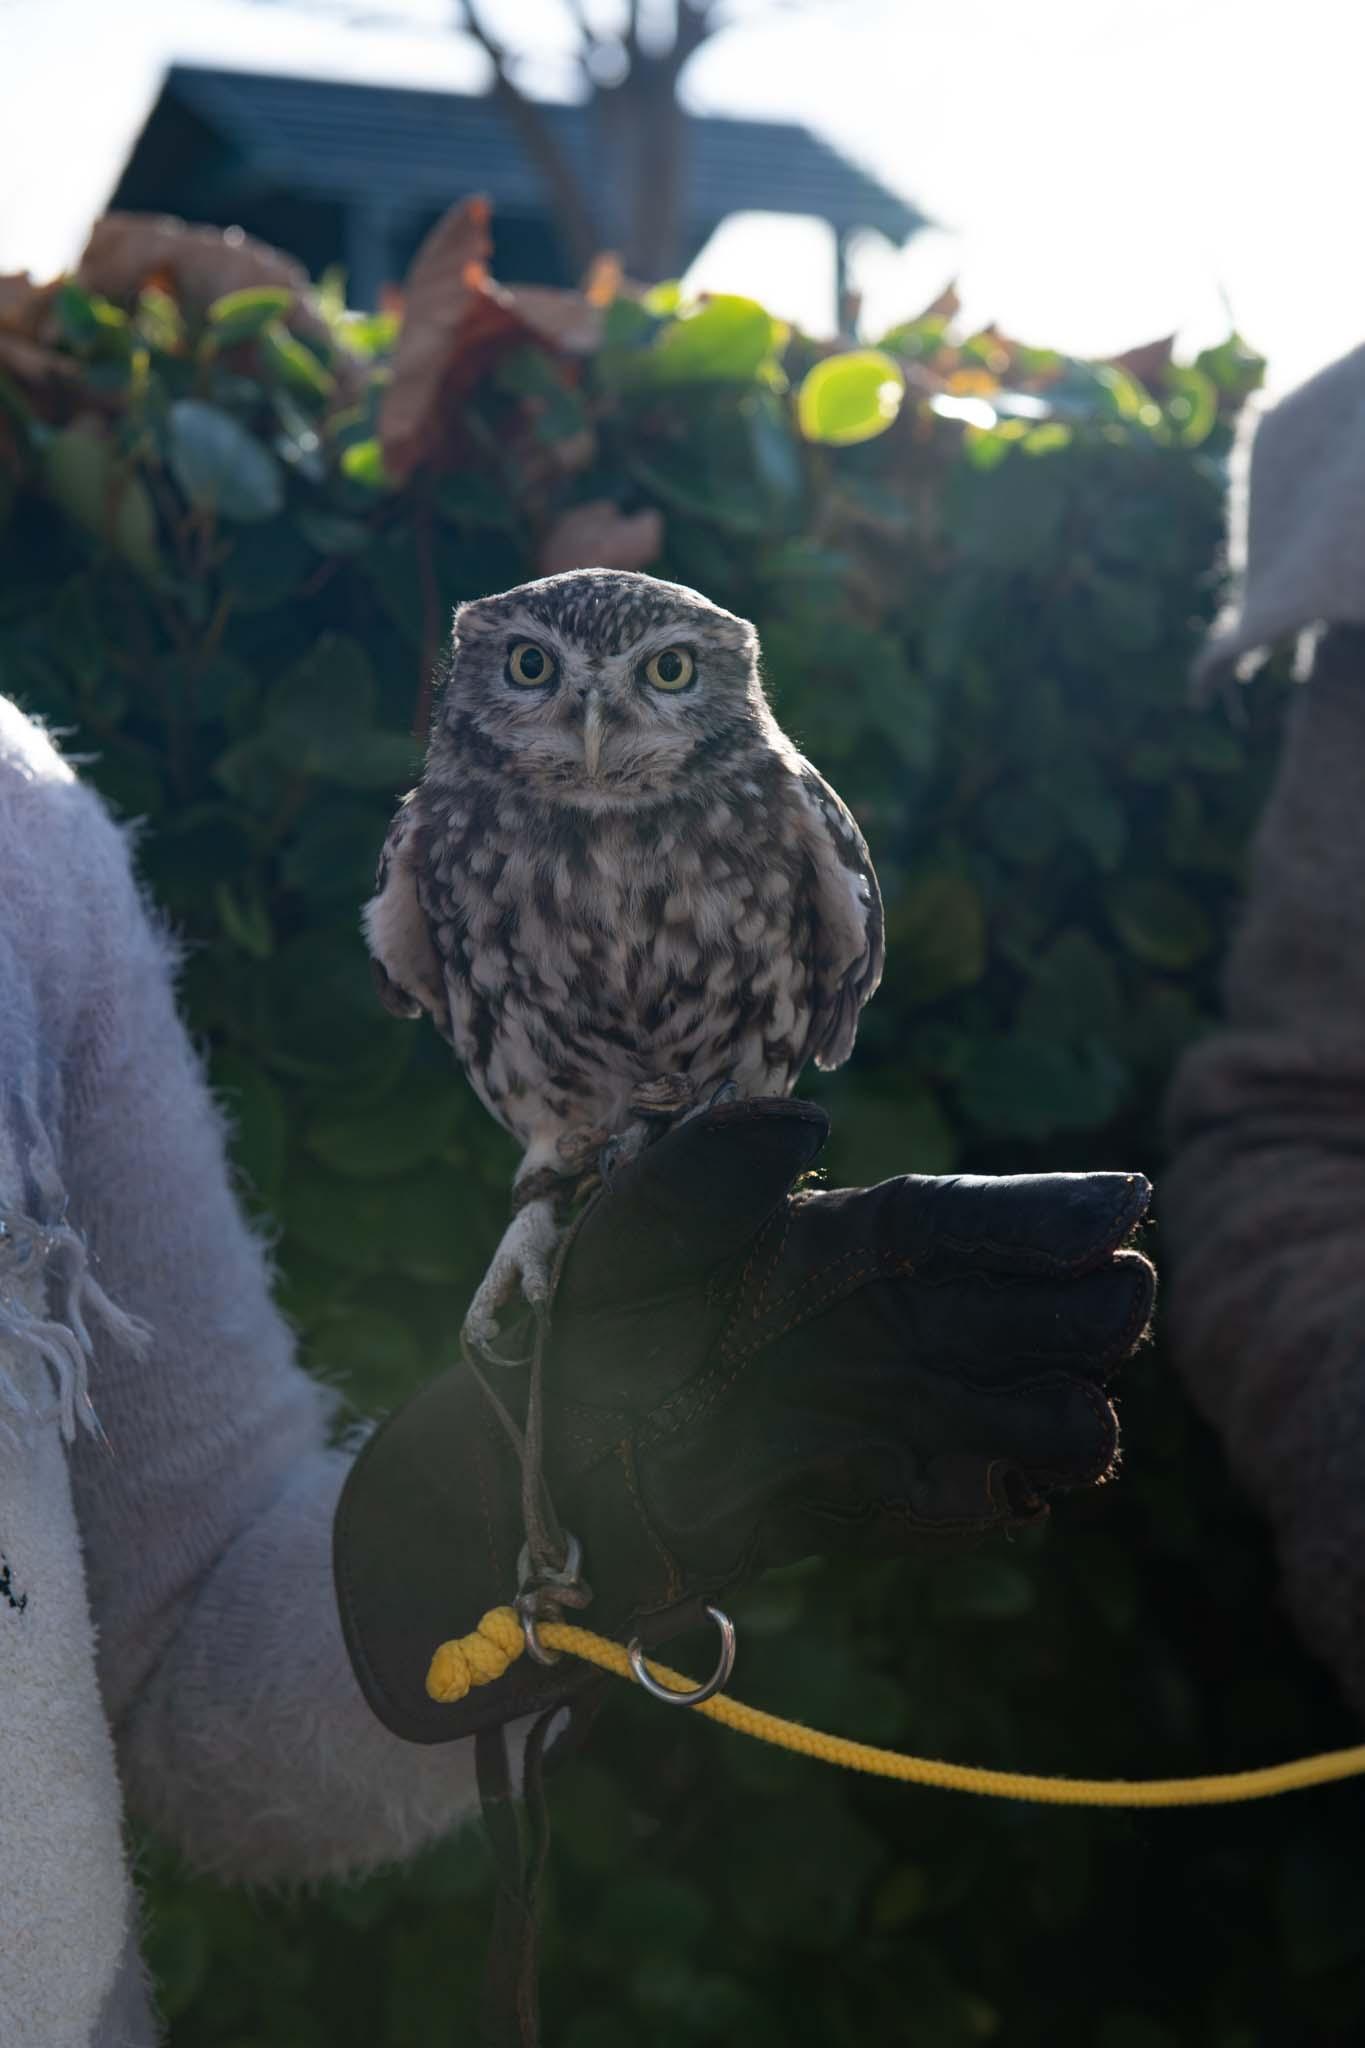 owls at affinity lancashire shopping centre